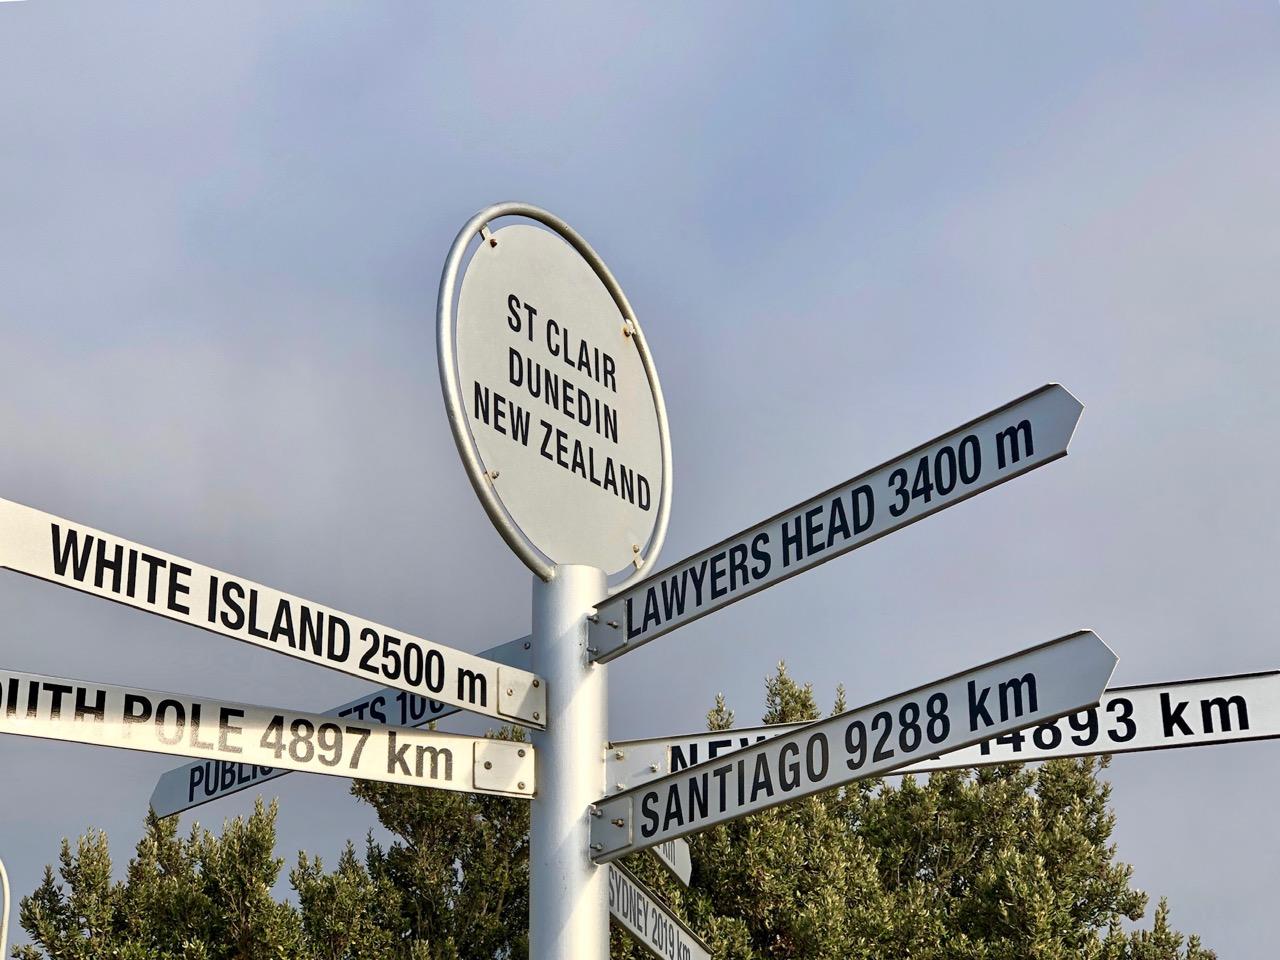 St Clair Dunedin